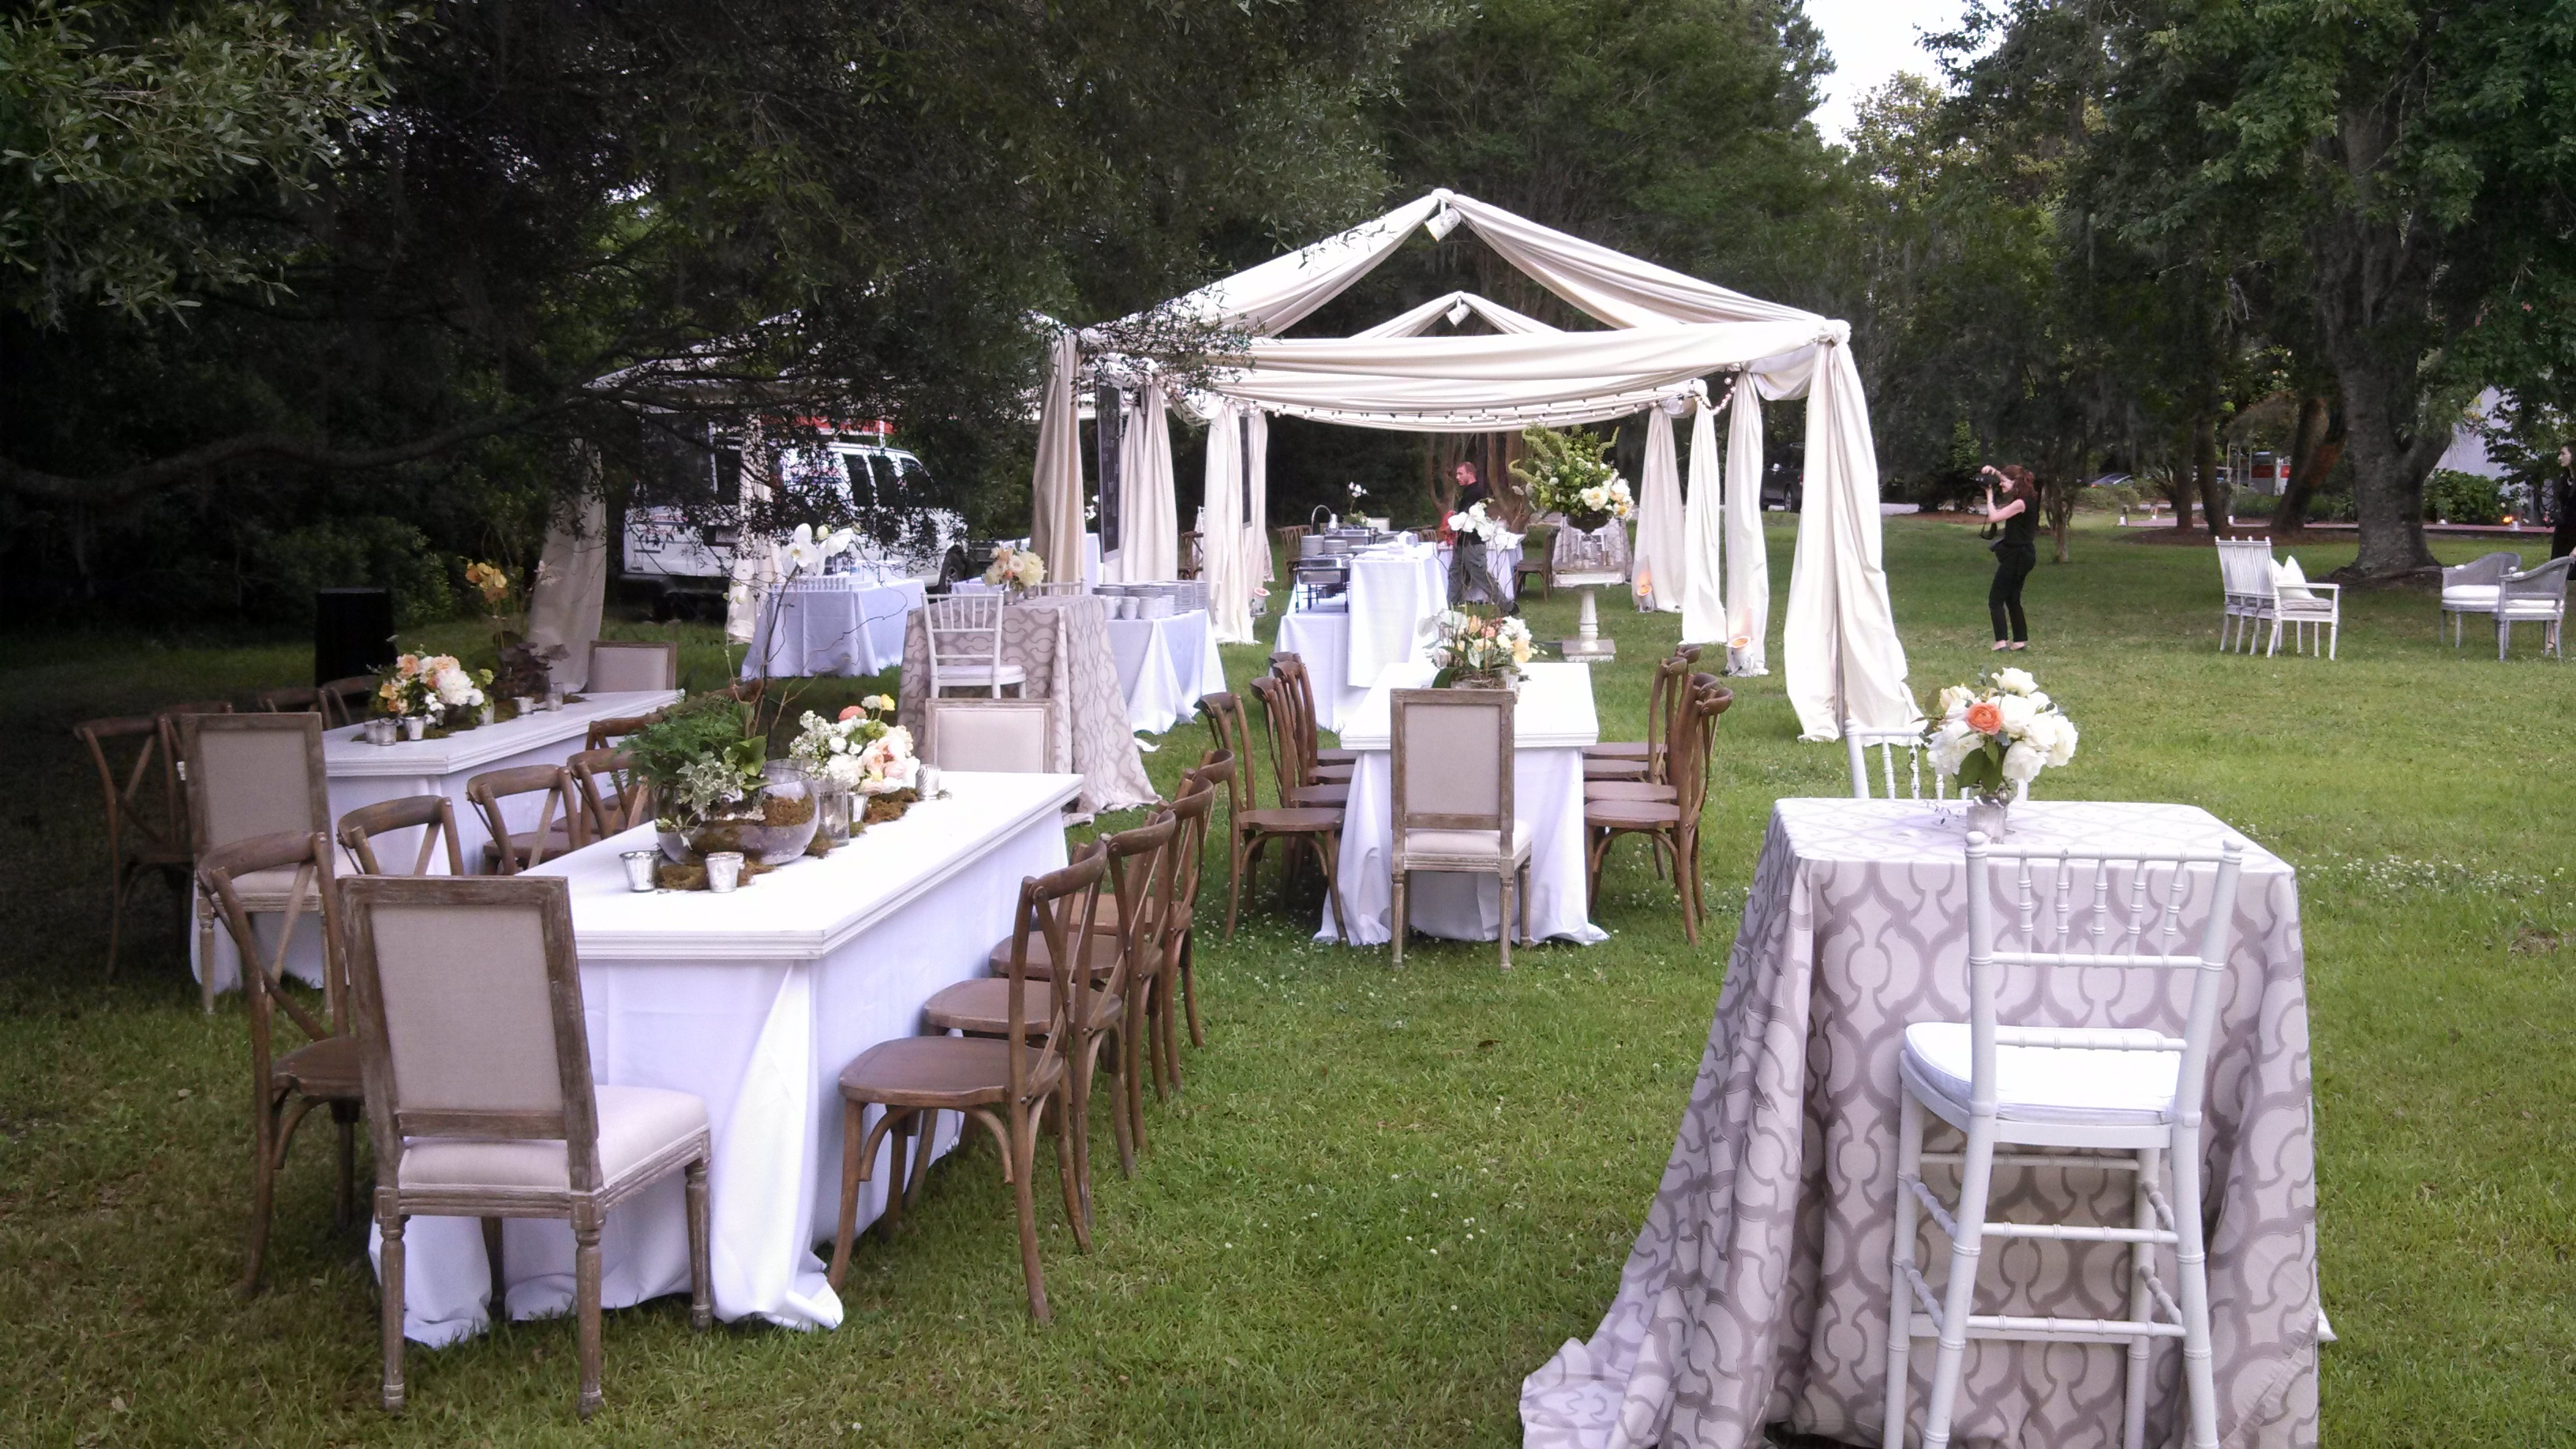 Tent Rentals And Wedding Around Chicagoland